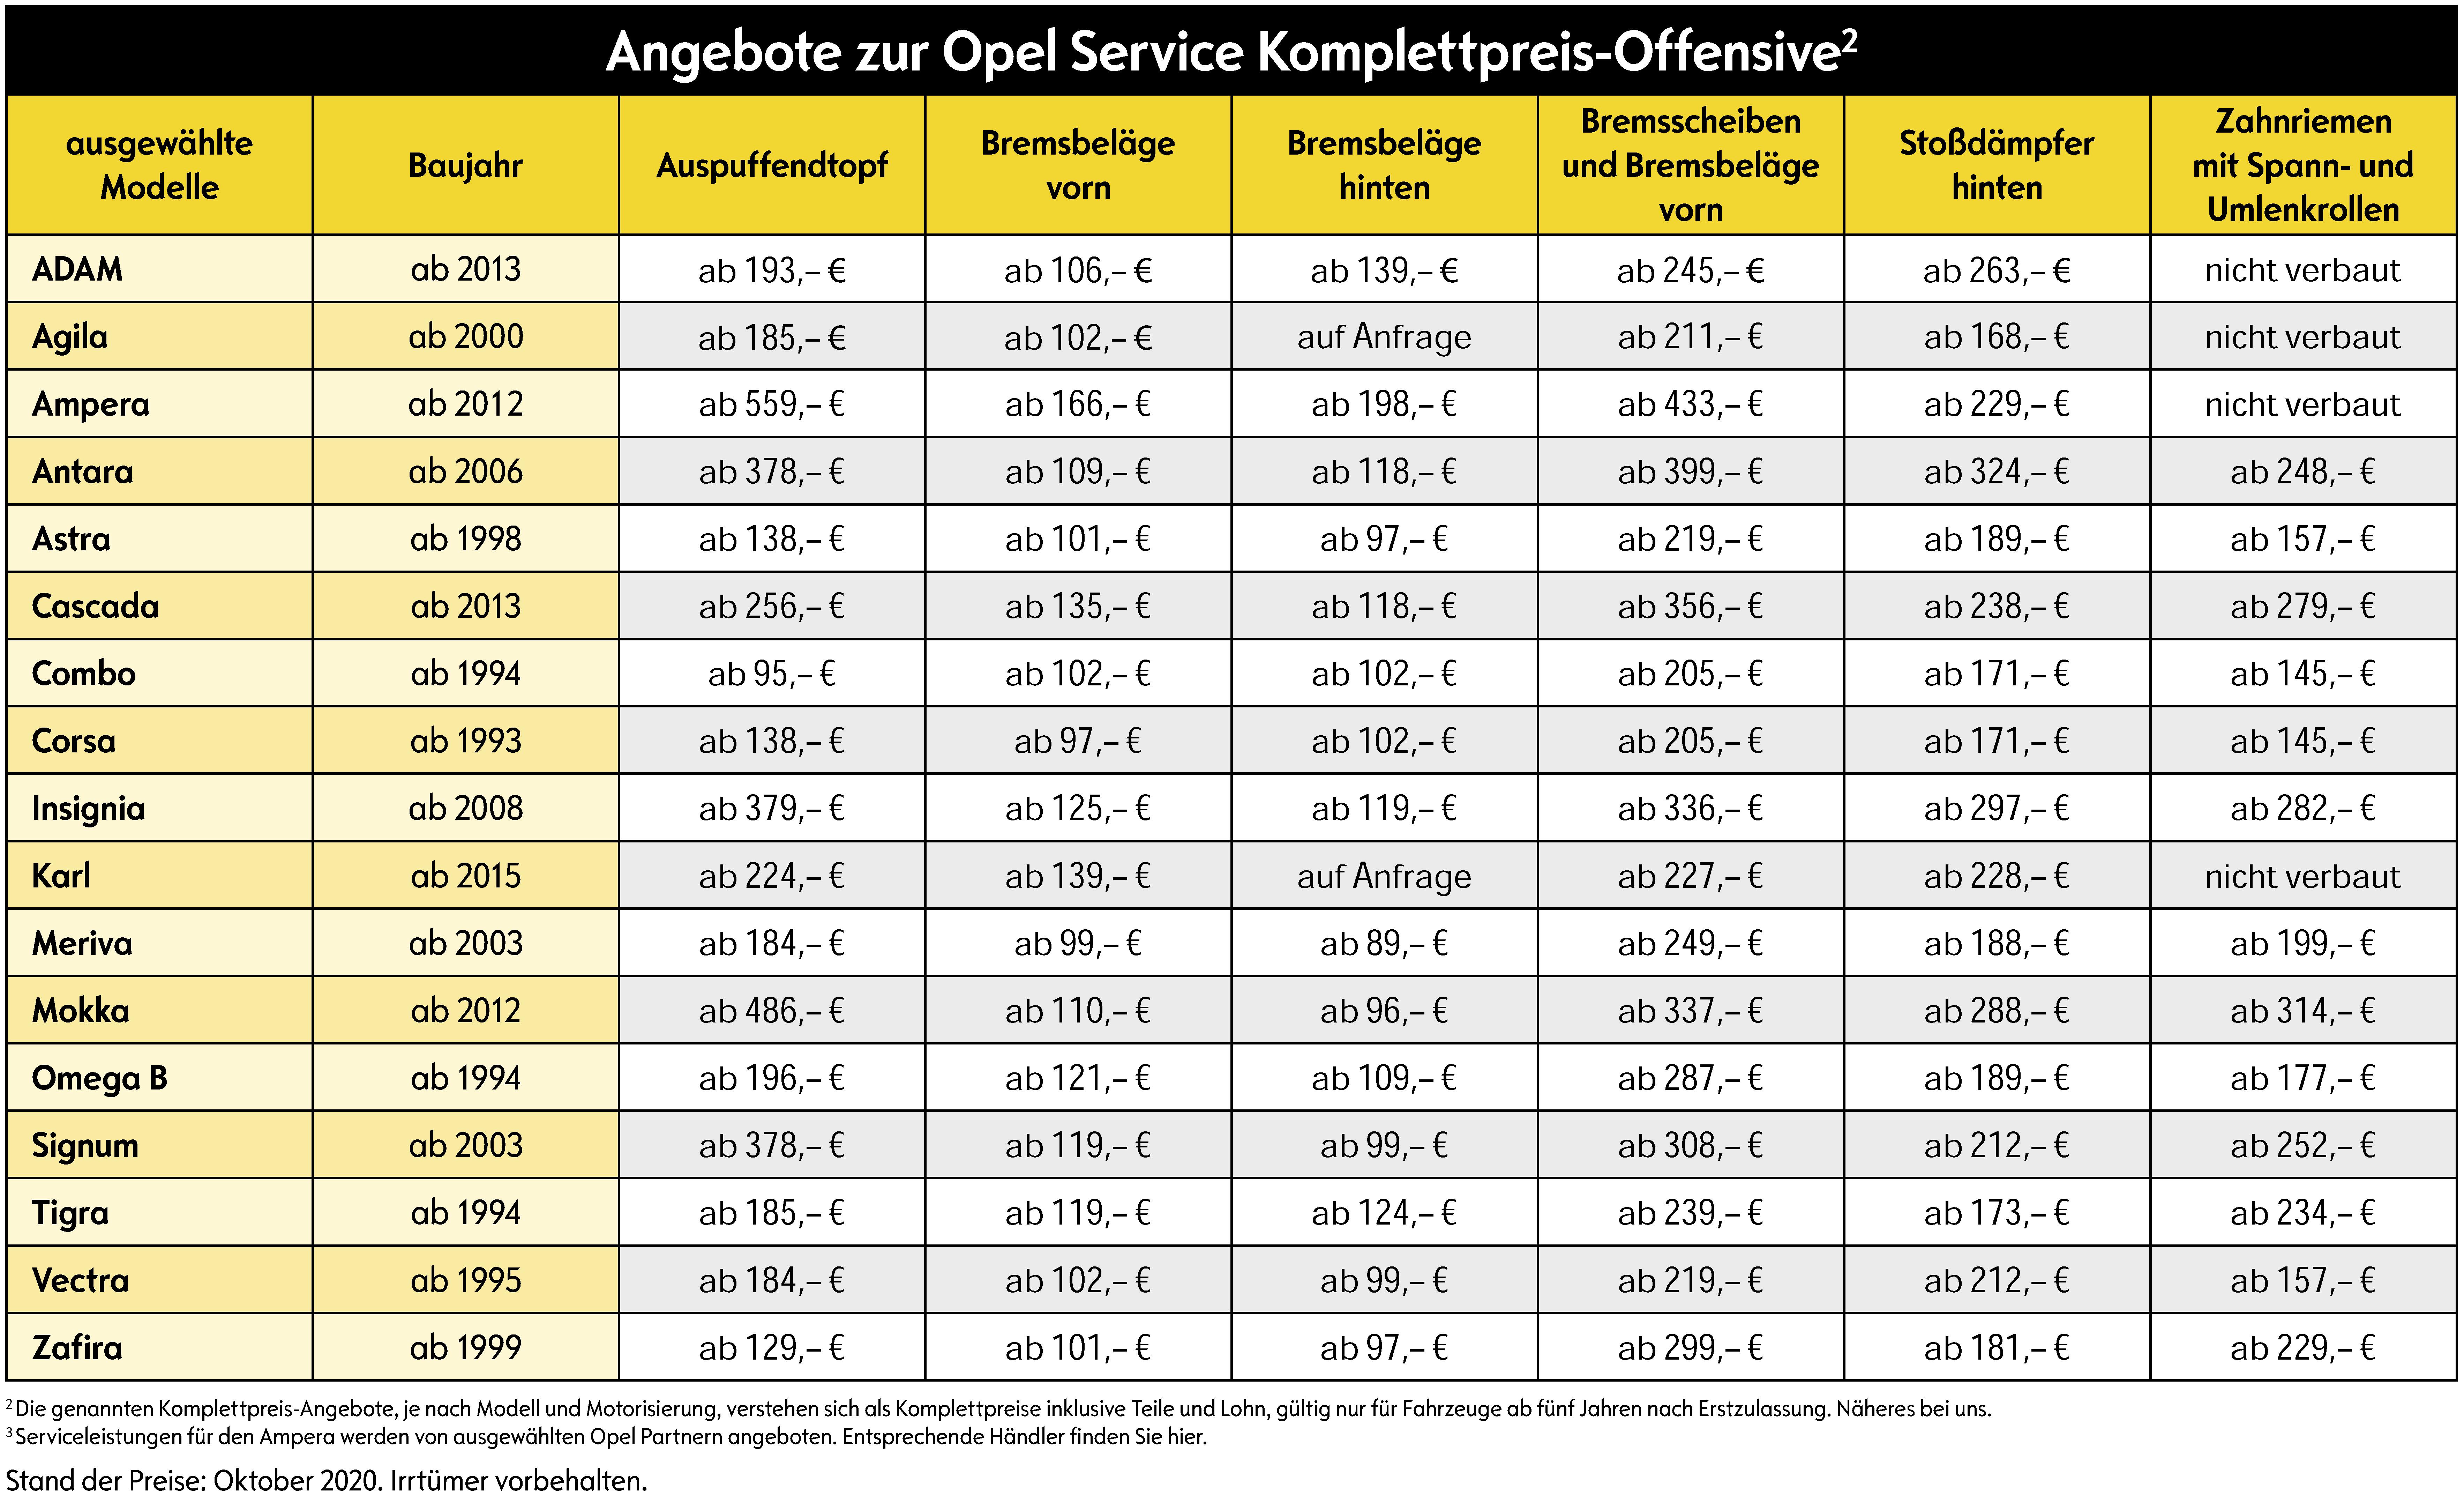 OSKO Tabelle Oktober 2020